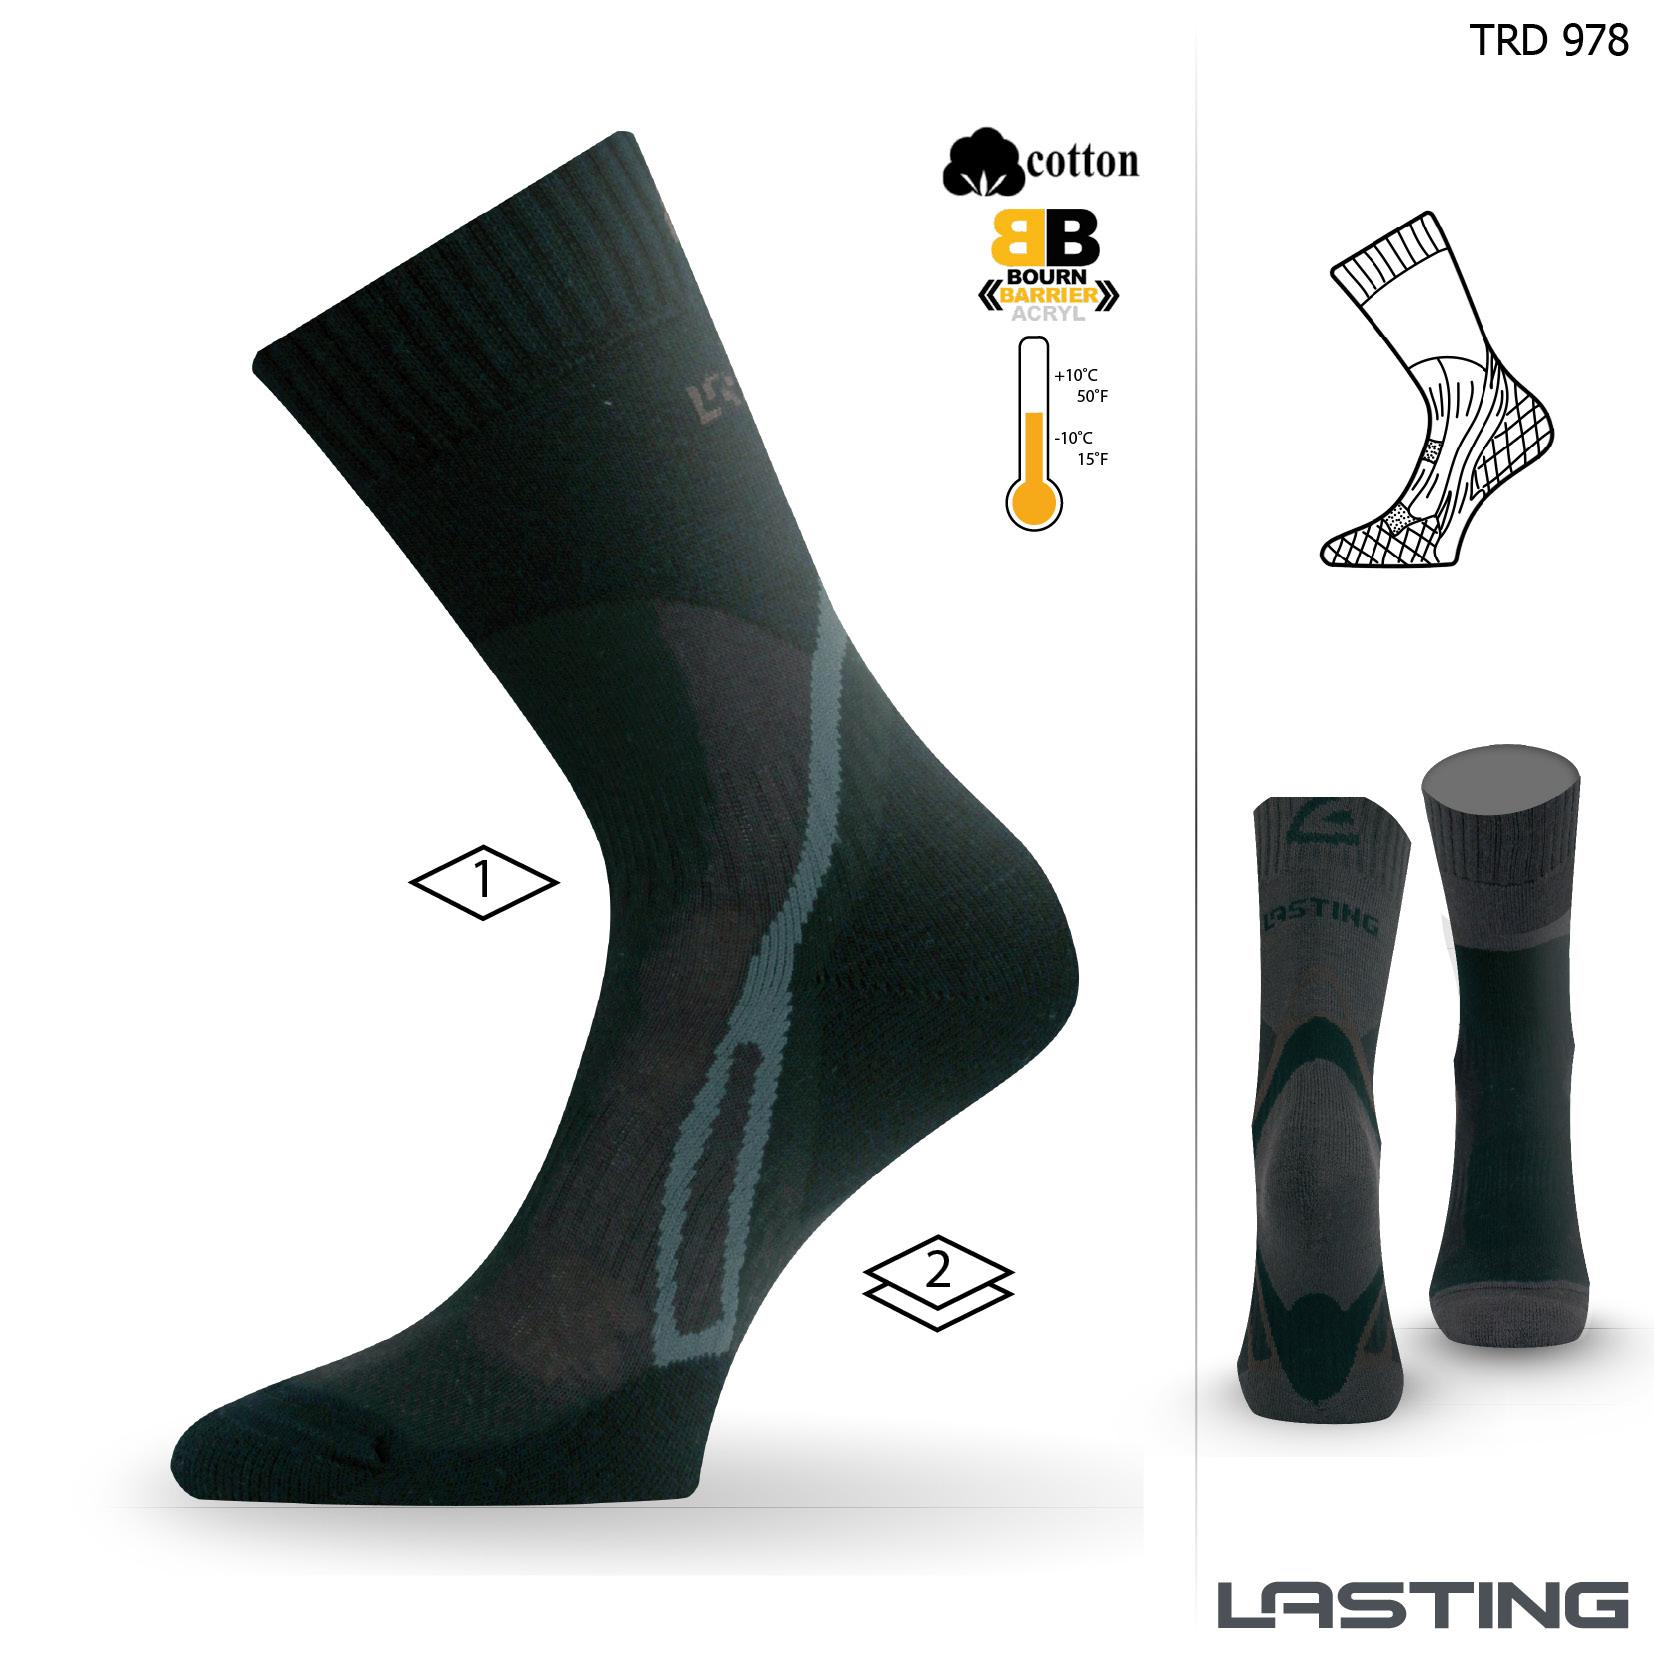 Lasting TRD 978 černá trekingová ponožka Velikost: (38-41) M